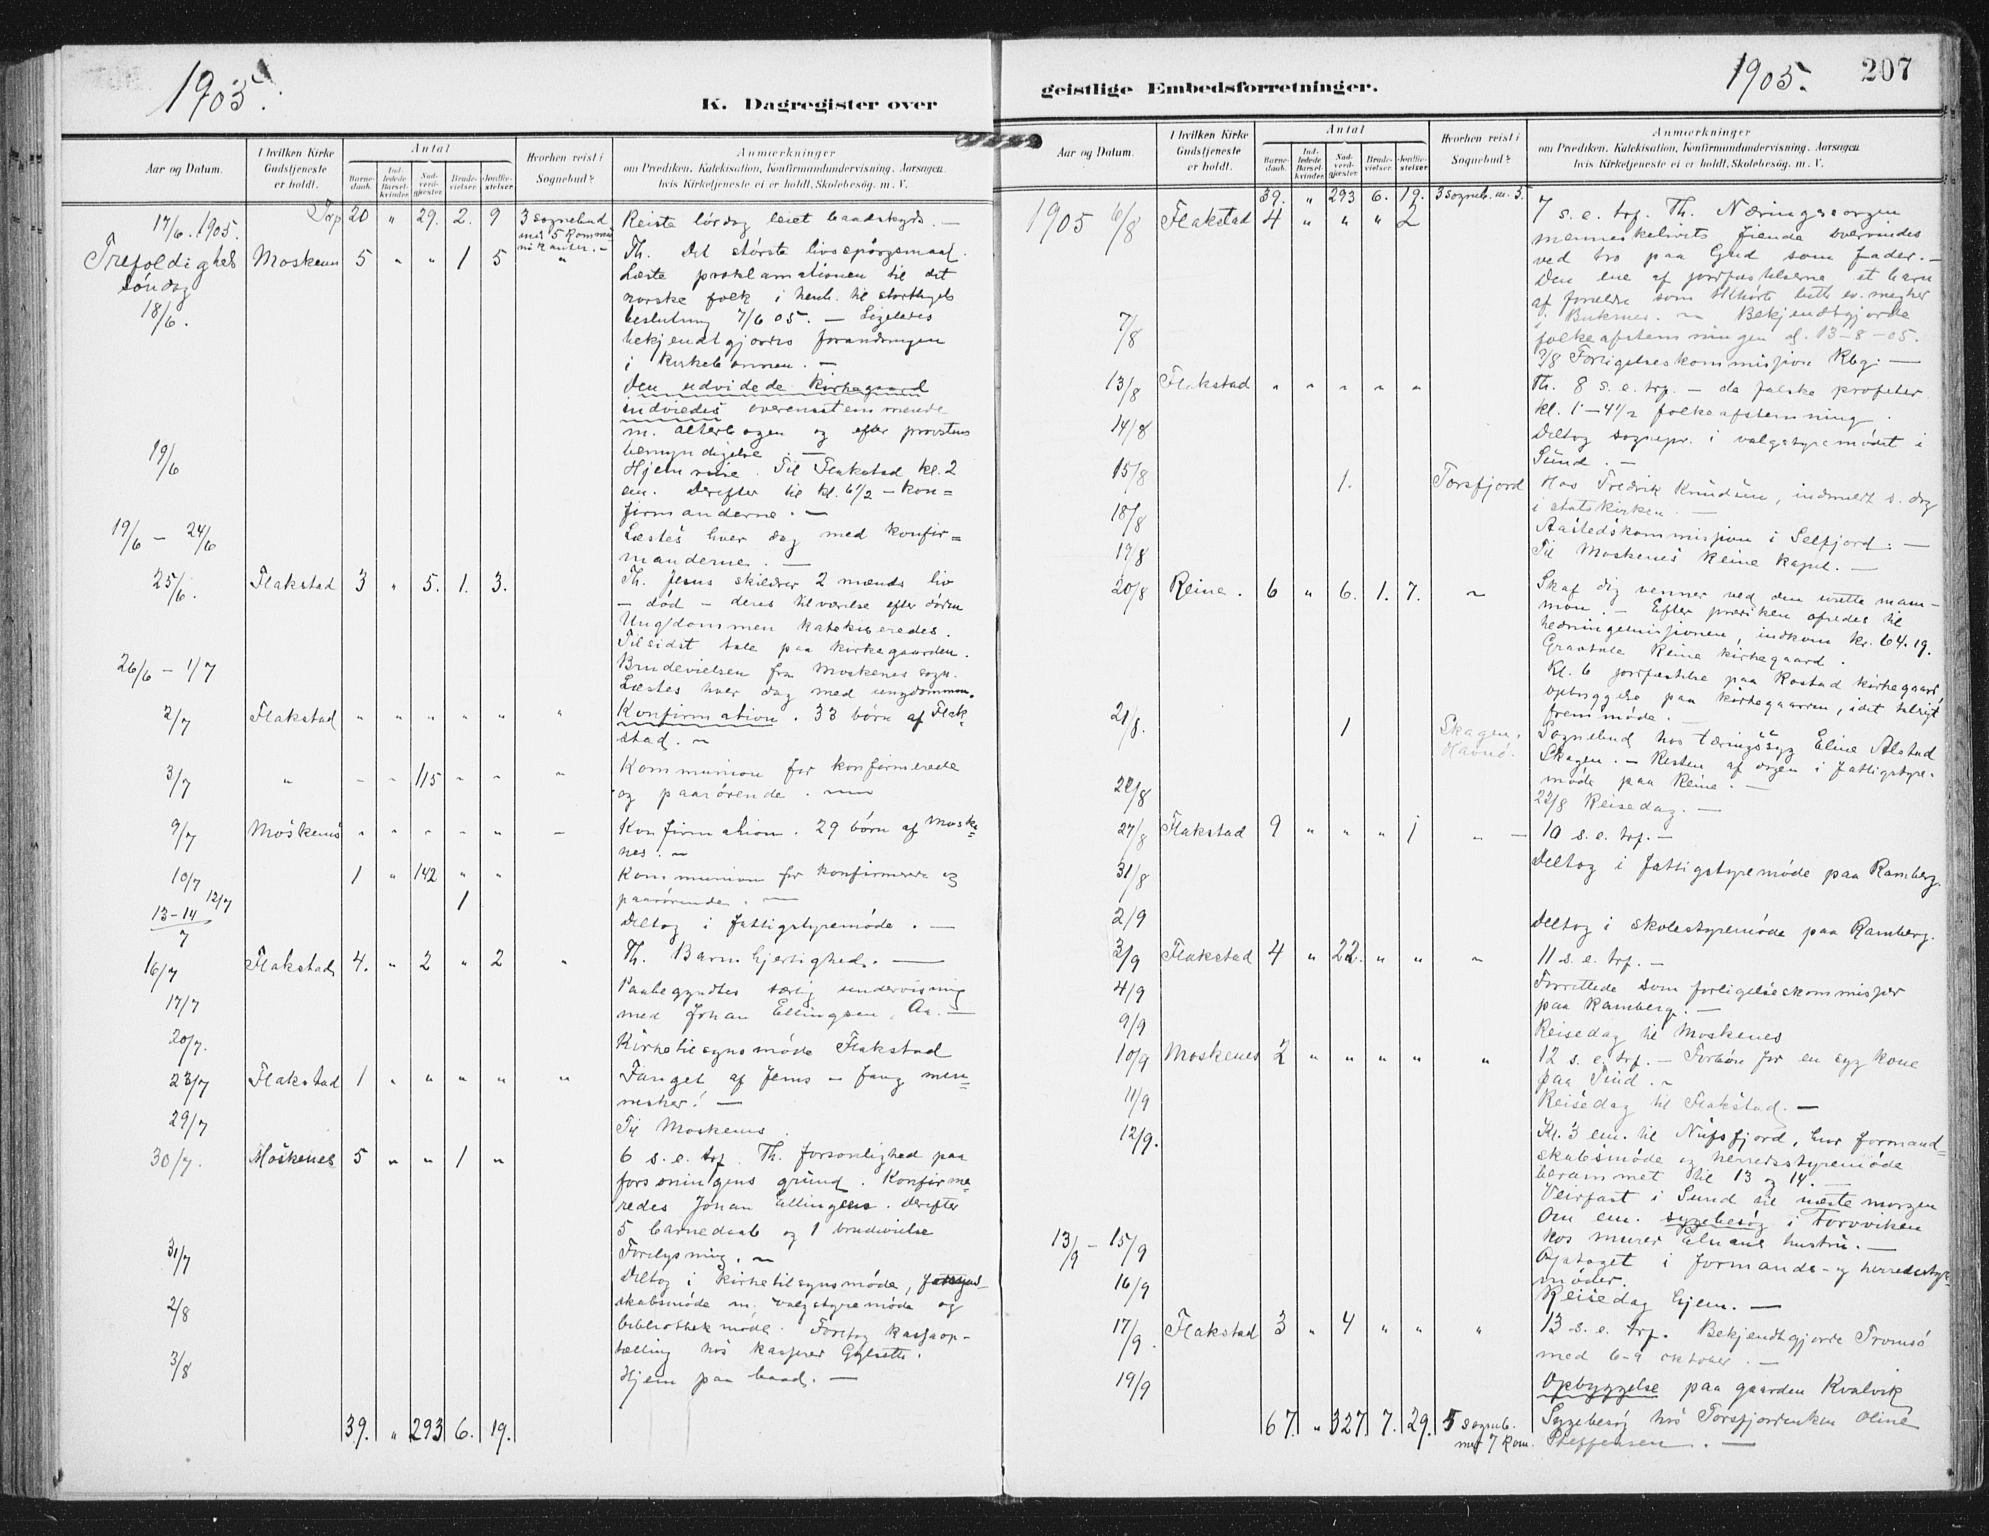 SAT, Ministerialprotokoller, klokkerbøker og fødselsregistre - Nordland, 885/L1206: Ministerialbok nr. 885A07, 1905-1915, s. 207